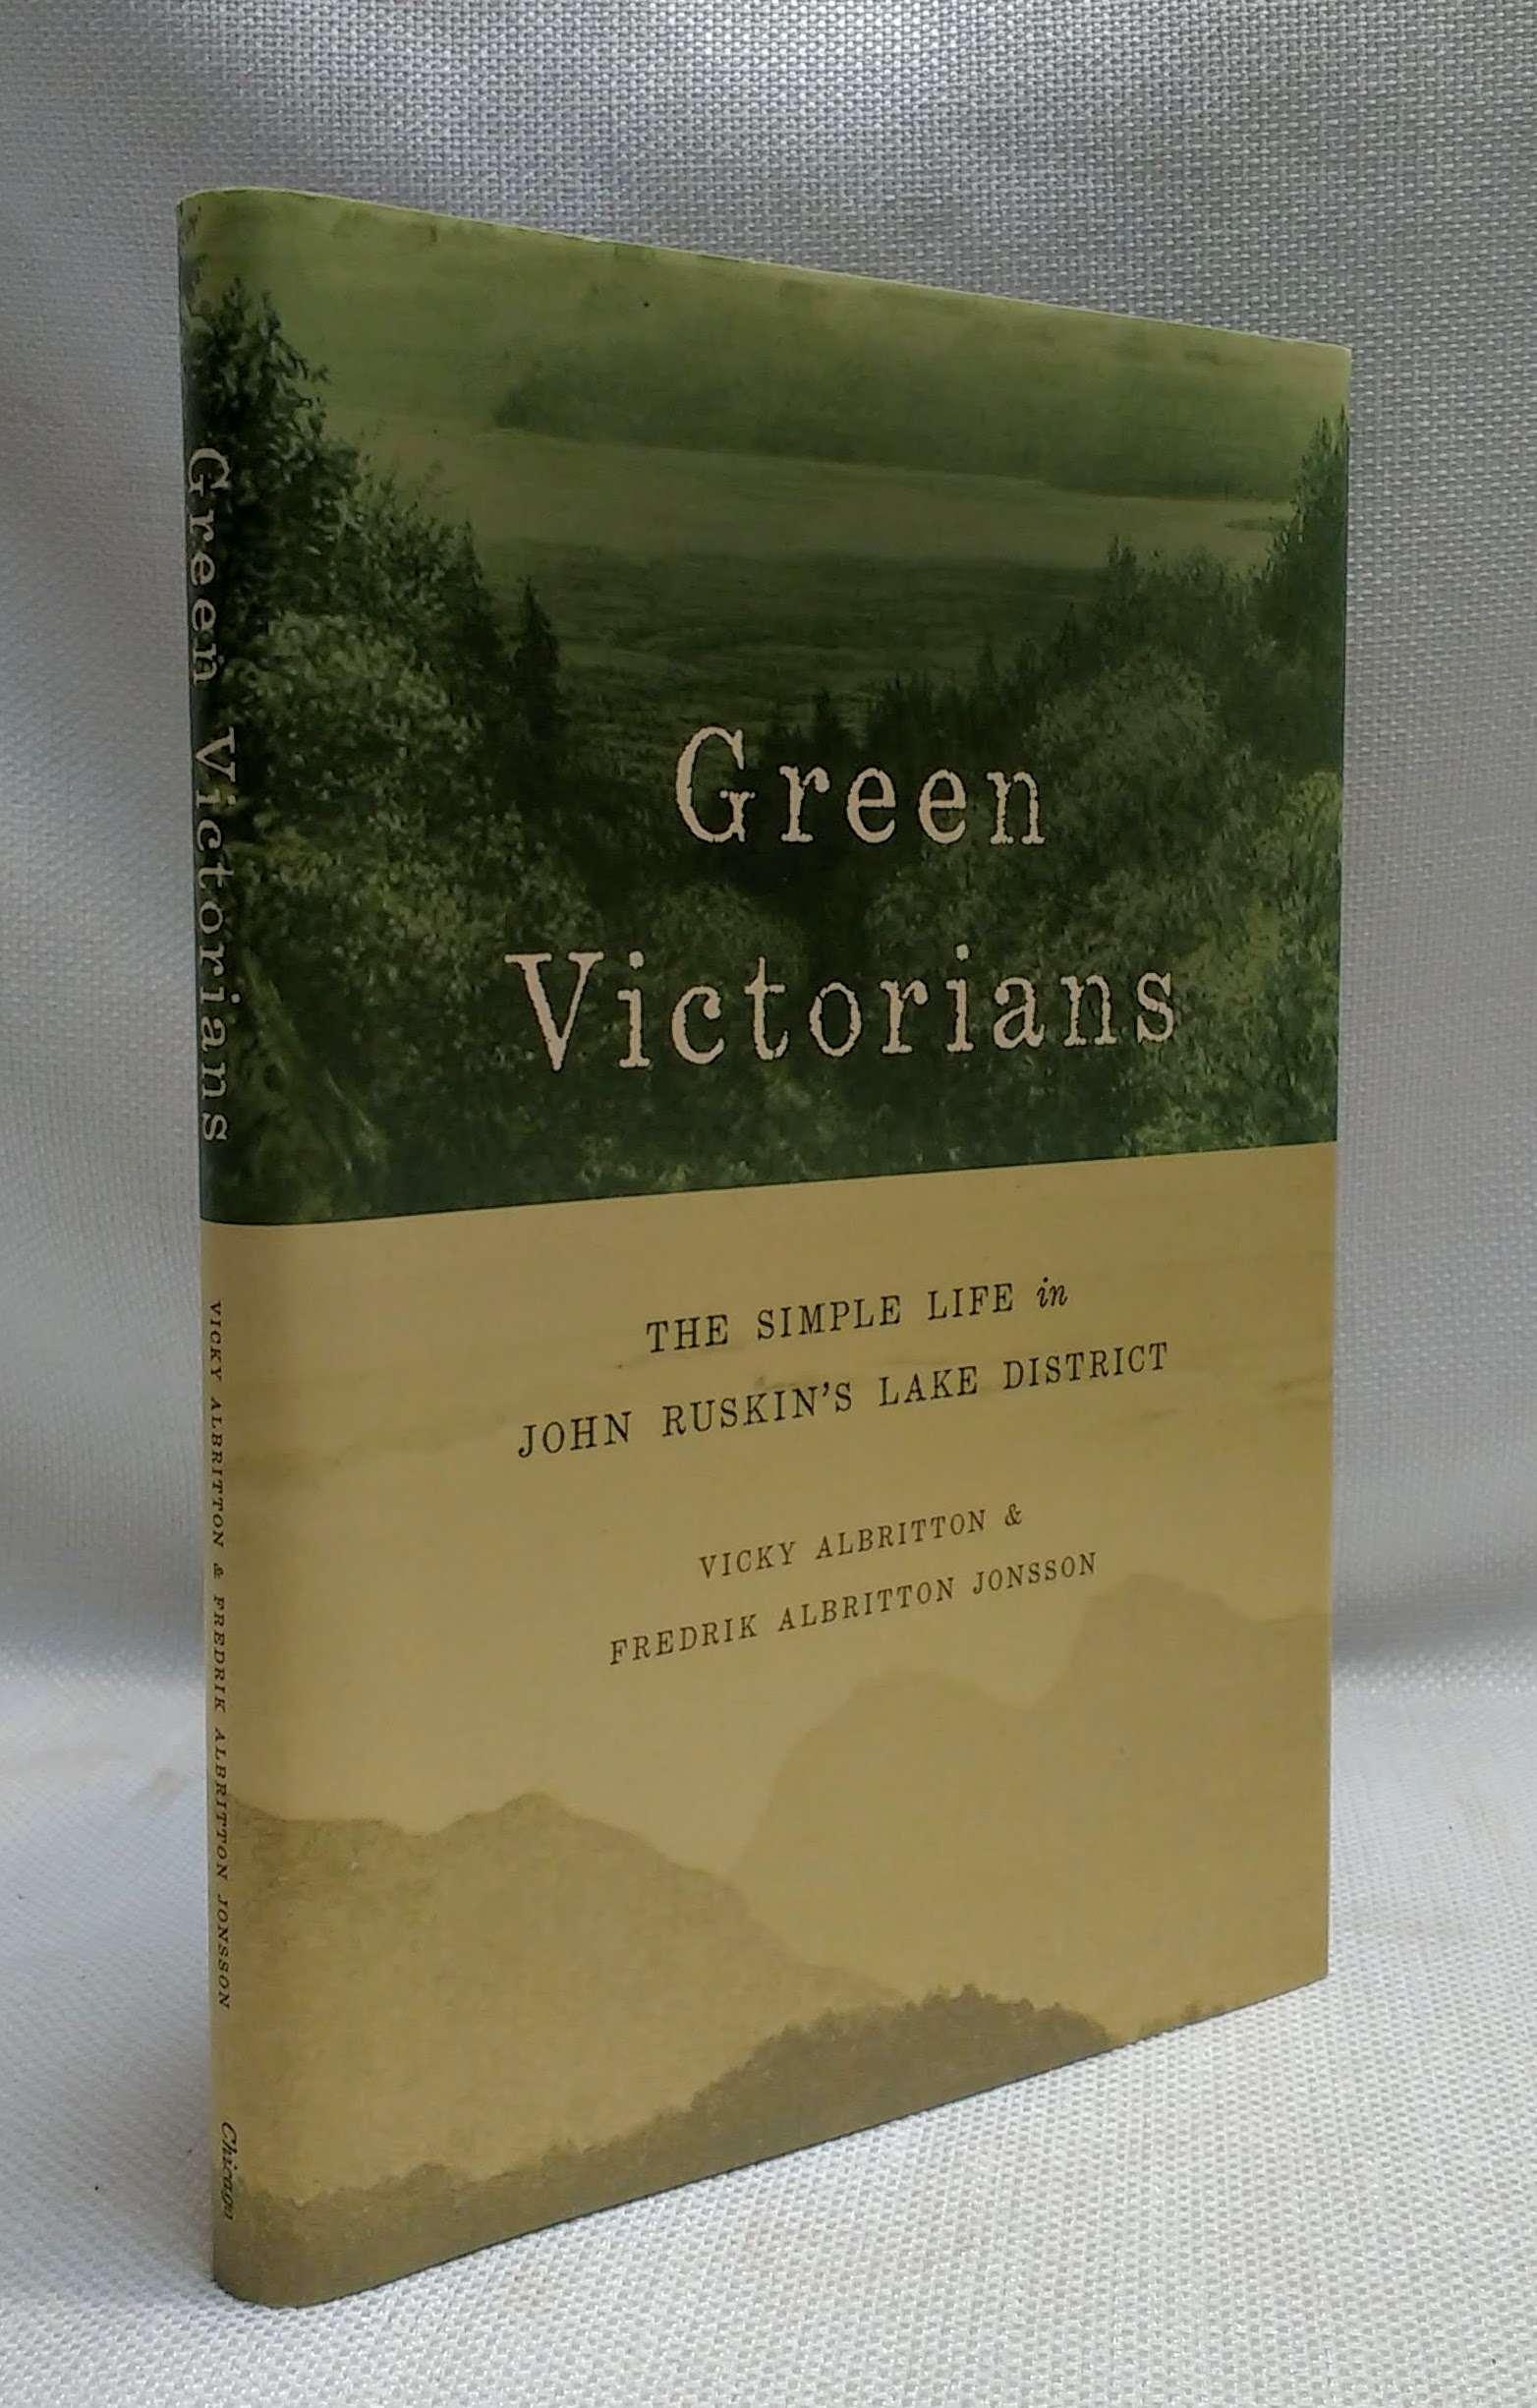 Green Victorians: The Simple Life in John Ruskin's Lake District, Albritton, Vicky; Jonsson, Fredrik Albritton